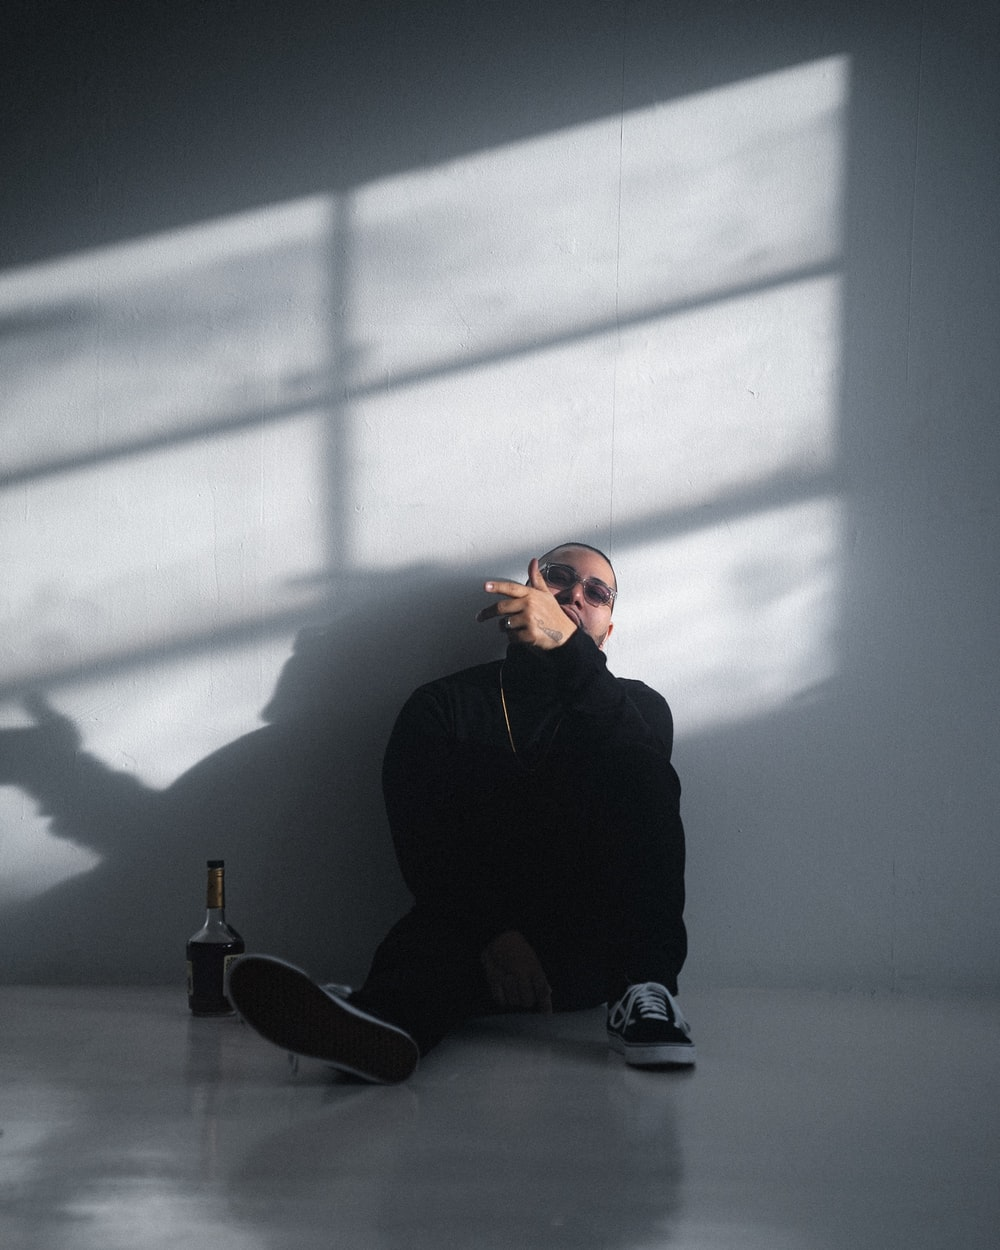 man in black long sleeve shirt and black pants sitting on floor